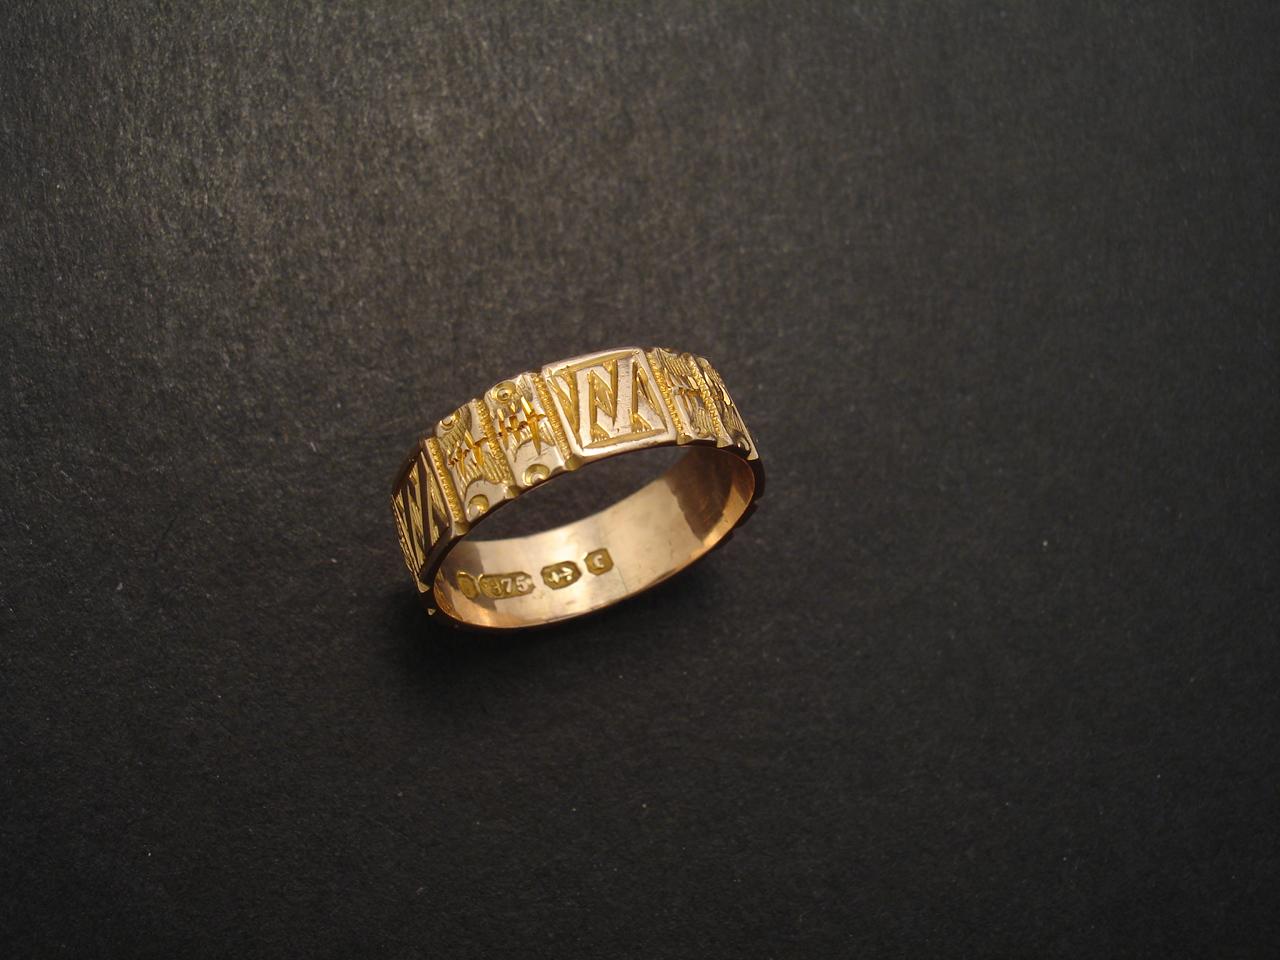 birmingham  english antique ct gold ring 1280 x 960 · jpeg